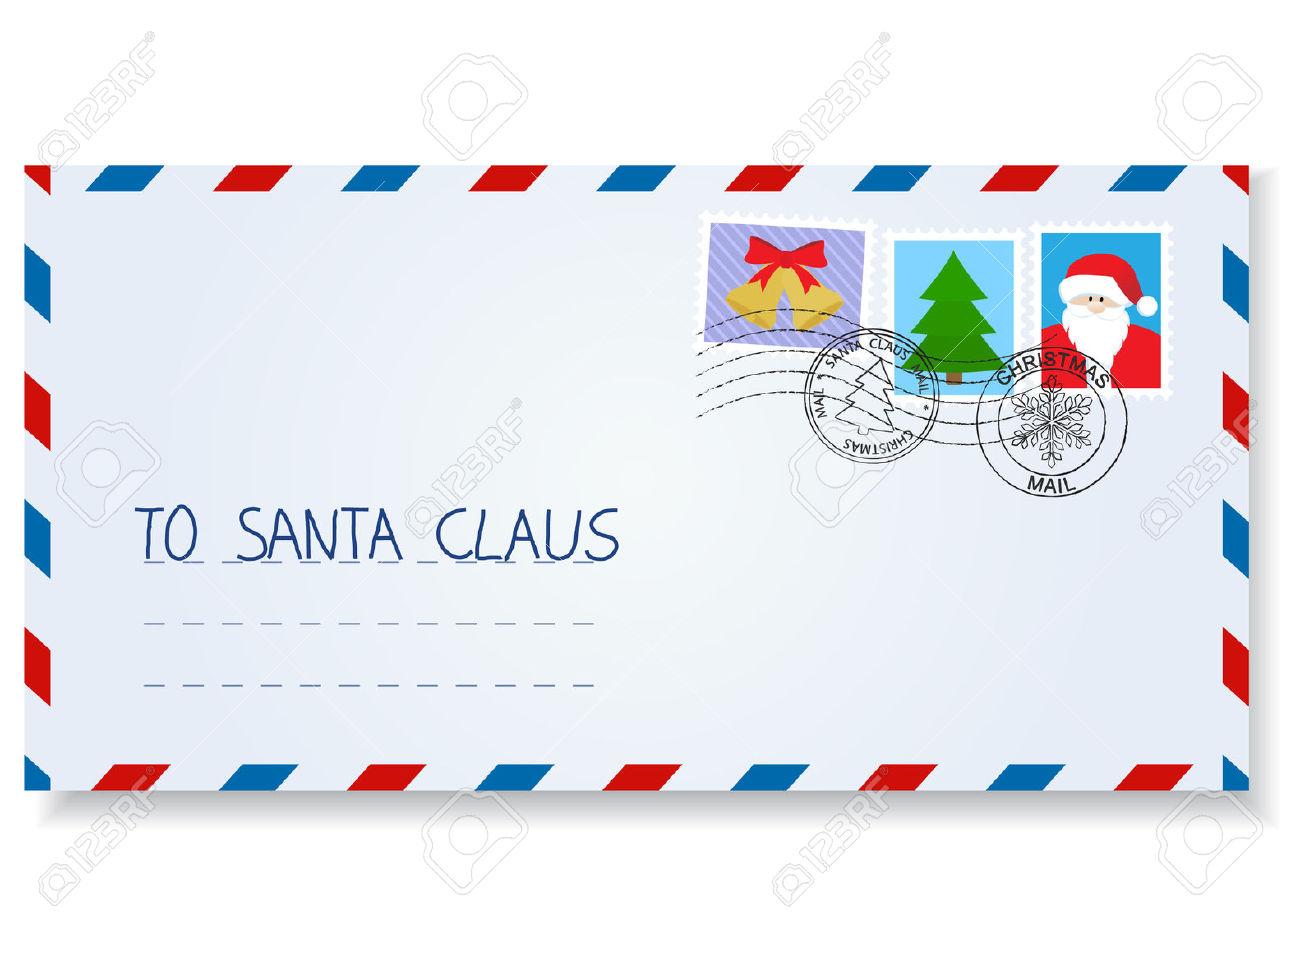 santa-letters-clipart-19 Vintage Colored Letter Template on basic cover, sample request, sample business, sample resignation,